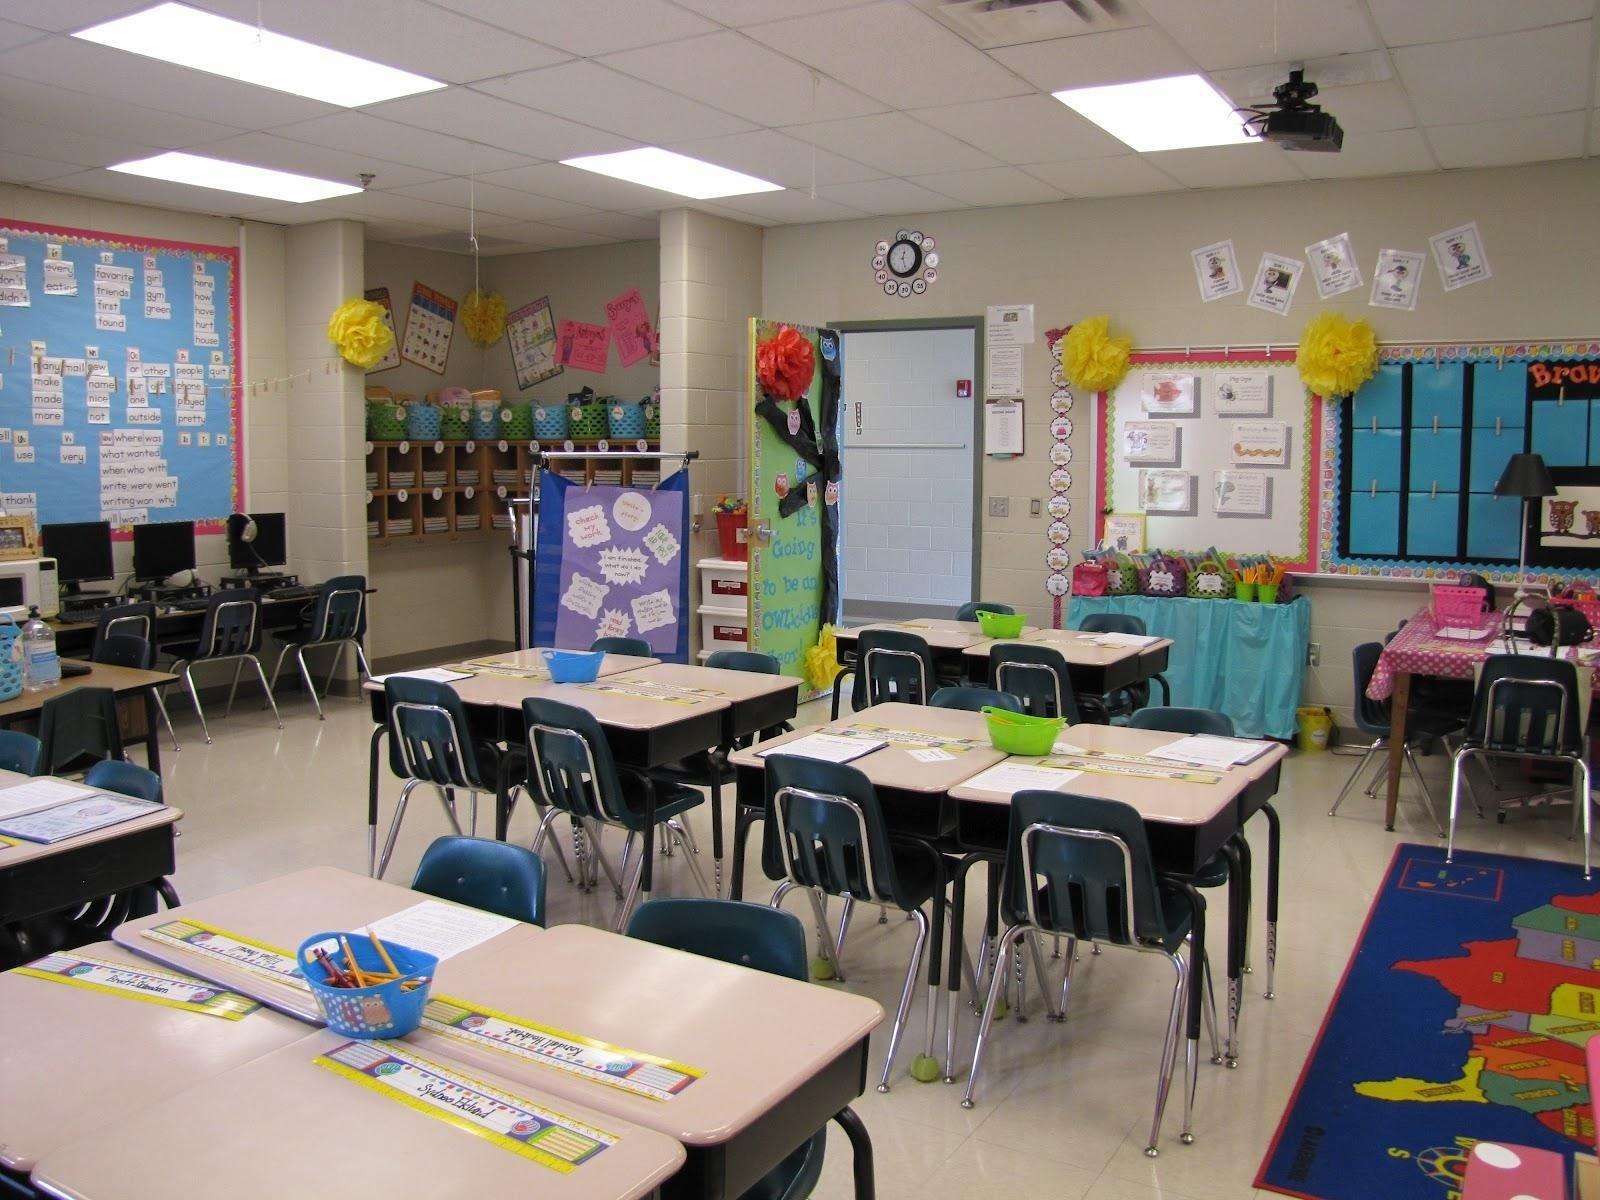 10 Fantastic Middle School Classroom Decorating Ideas best classroom decorating ideas new decoration best classroom 2020